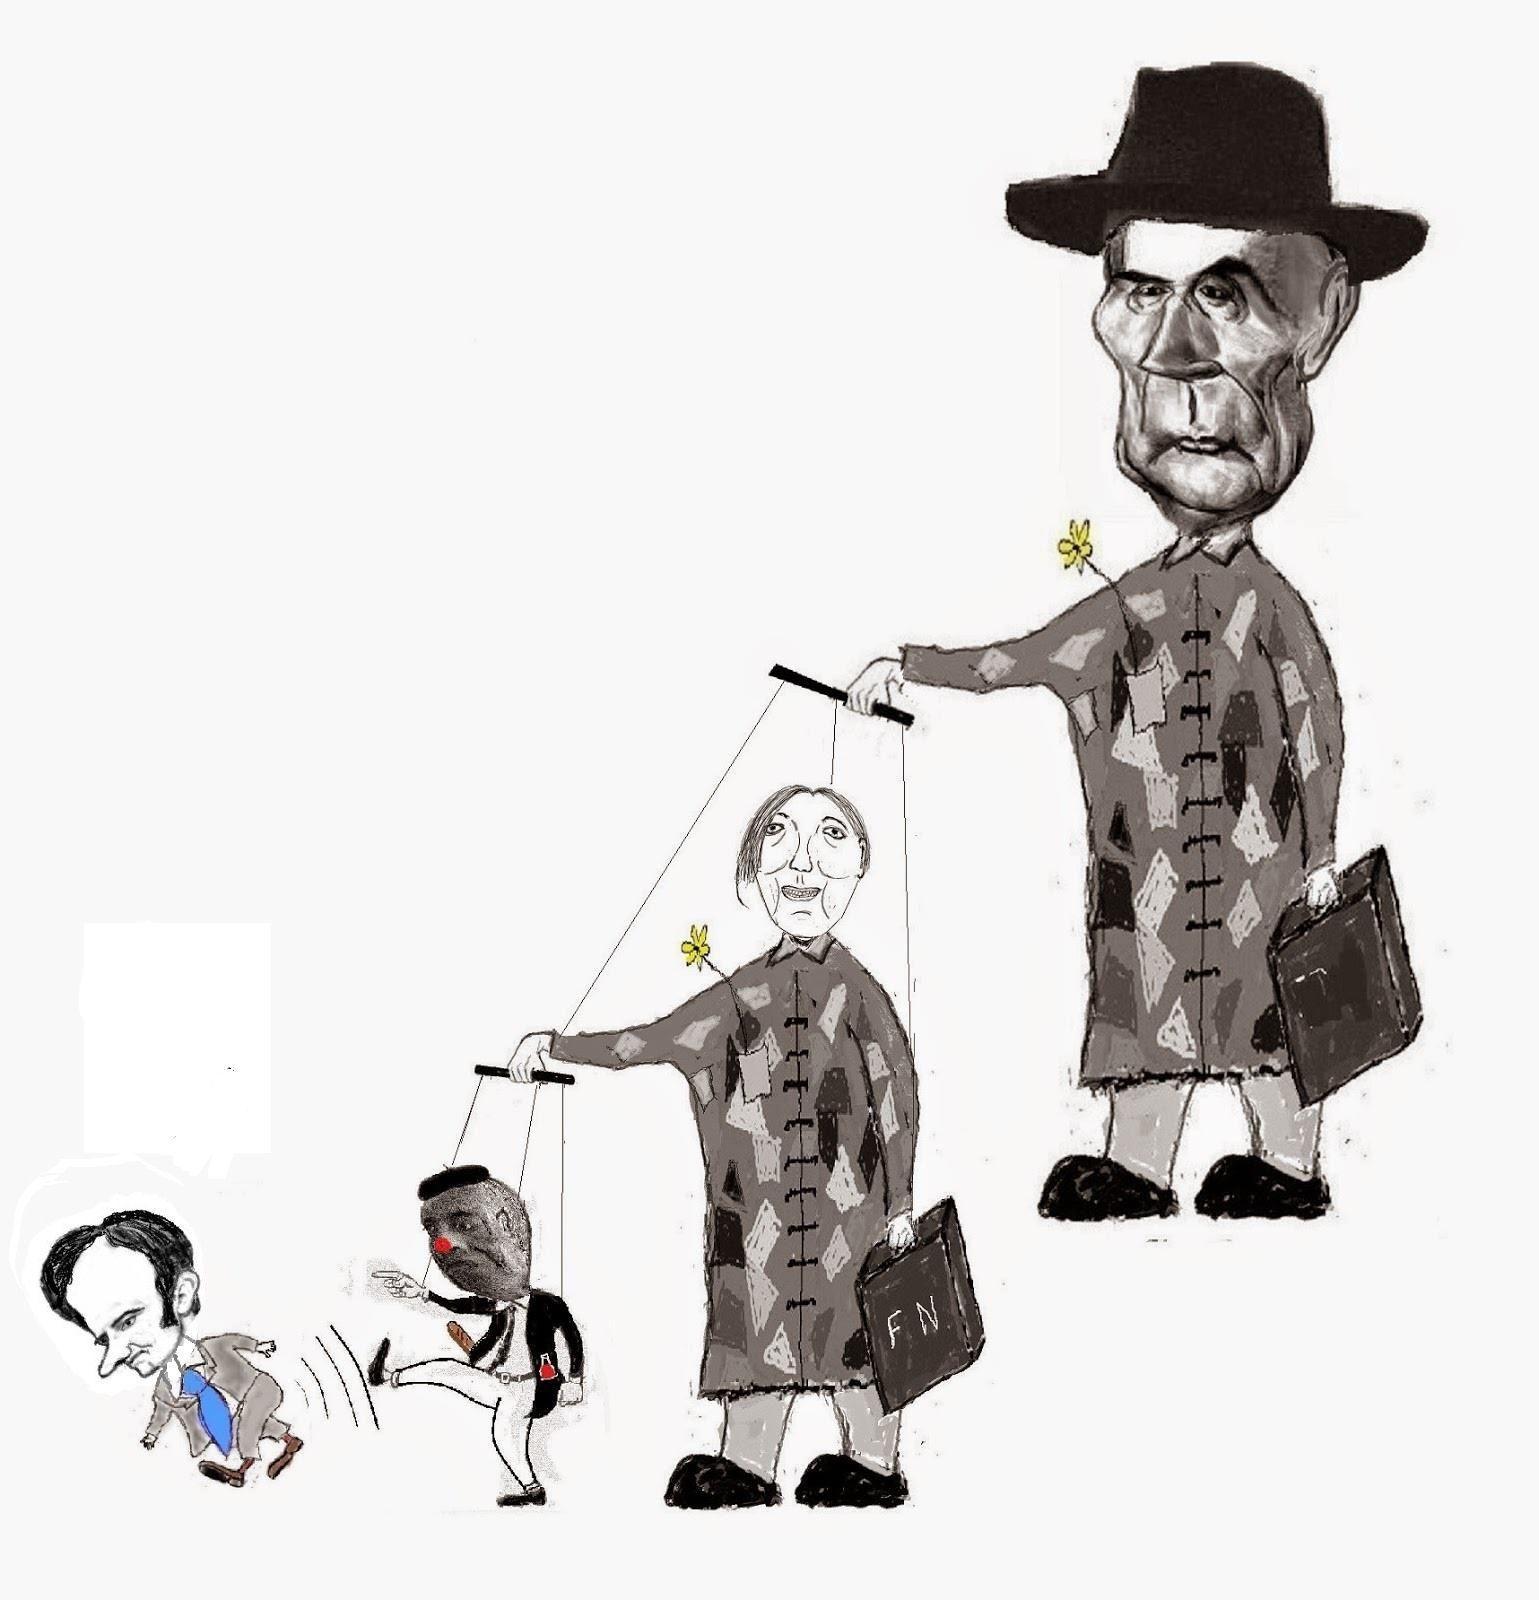 Non madame Taubira, non monsieur Emmanuel Macron, les politiques de non-incarcération ne freinent pas la criminalité. No, Señora  Taubira, no Senor Macron las políticas de no encarcelamiento no inhiben la delincuencia.